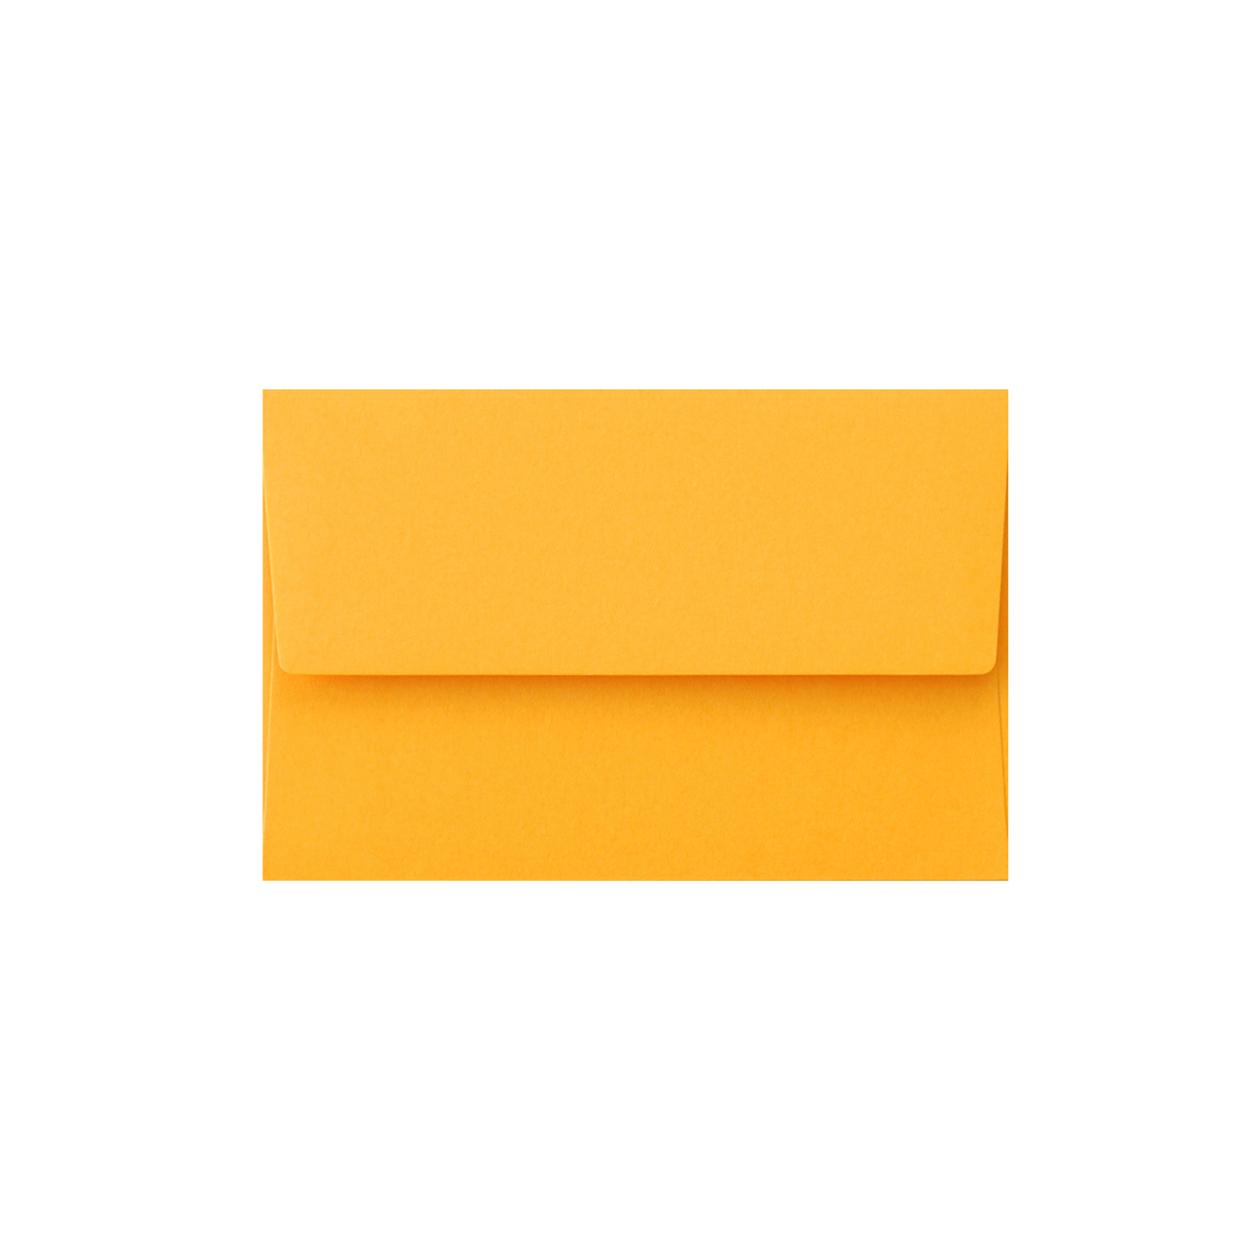 NEカマス封筒 コットン(NTラシャ) 山吹 116.3g